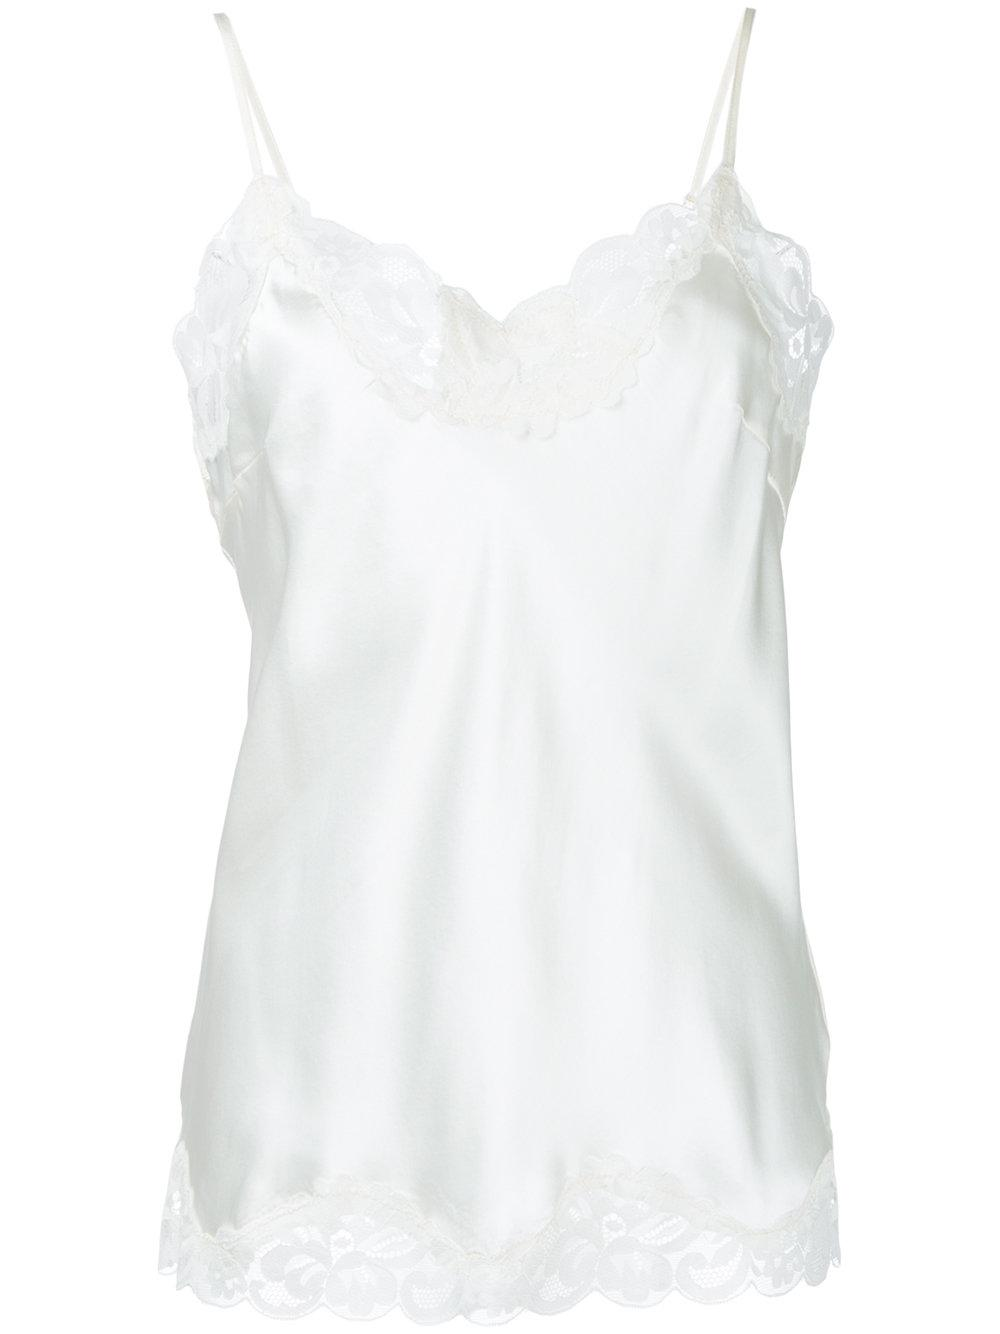 Silk Lace Top Item # GH152-B